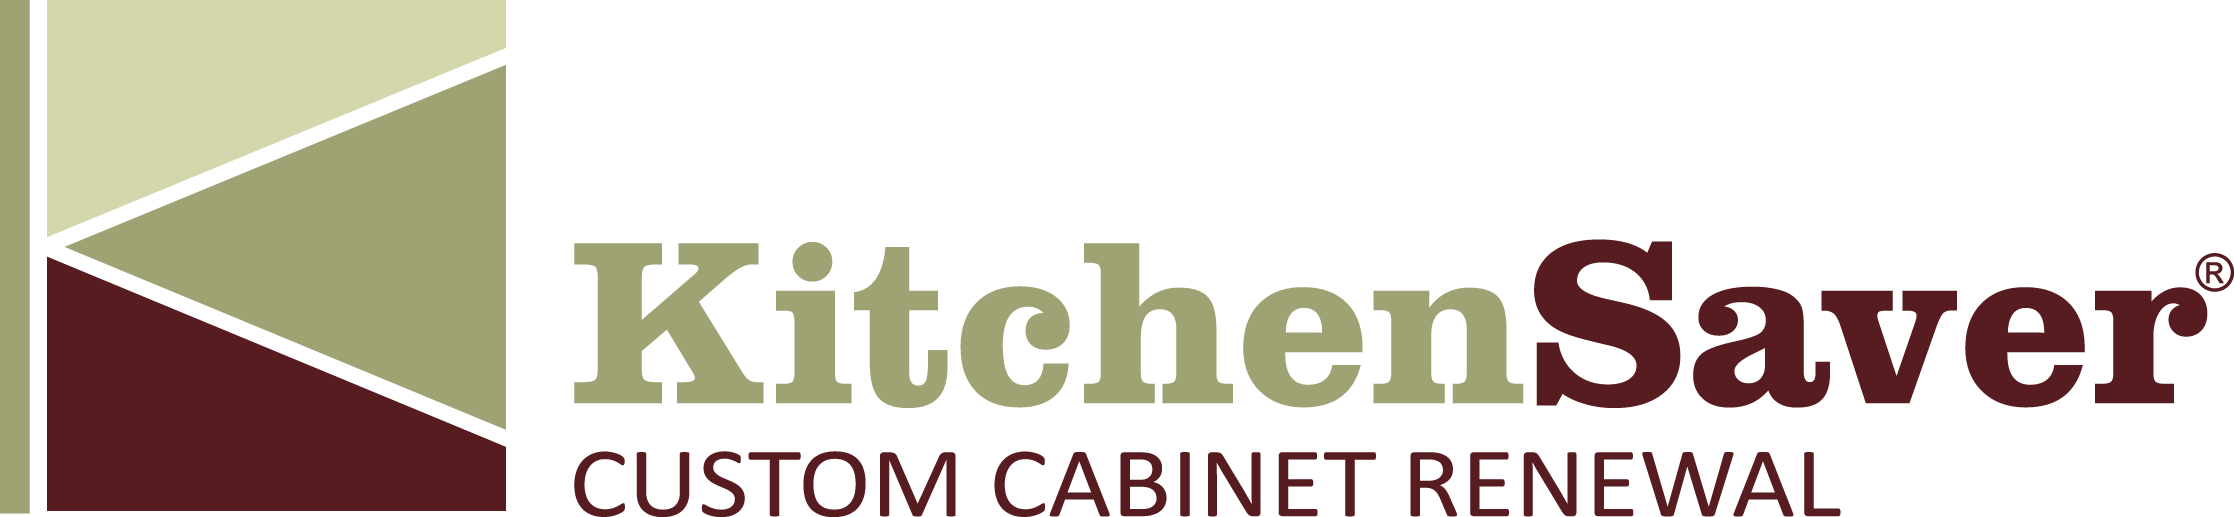 Kitchen Saver.png